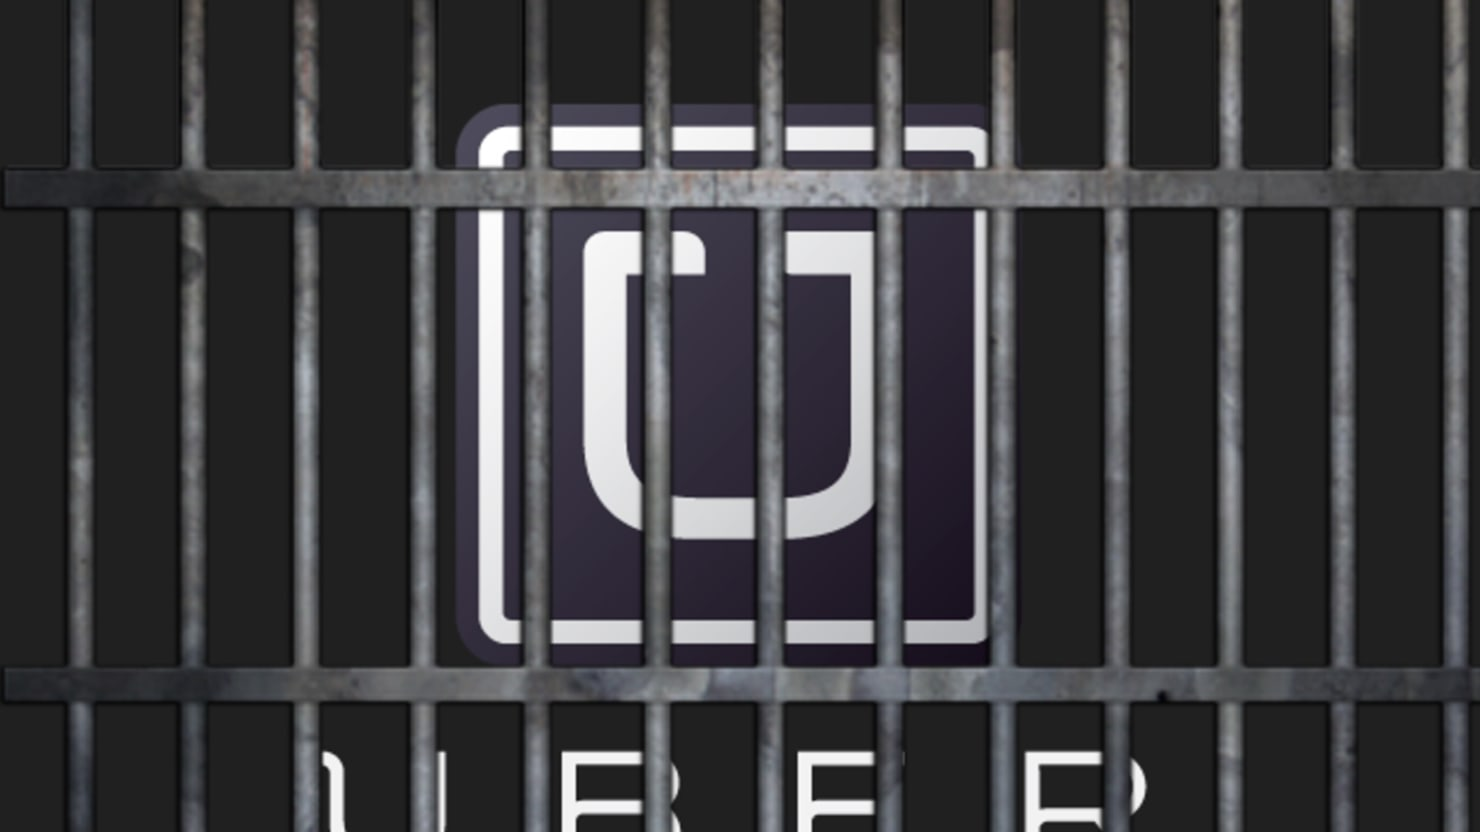 More Bad News for Uber: Driver Arrested in Los Angeles Rape Case